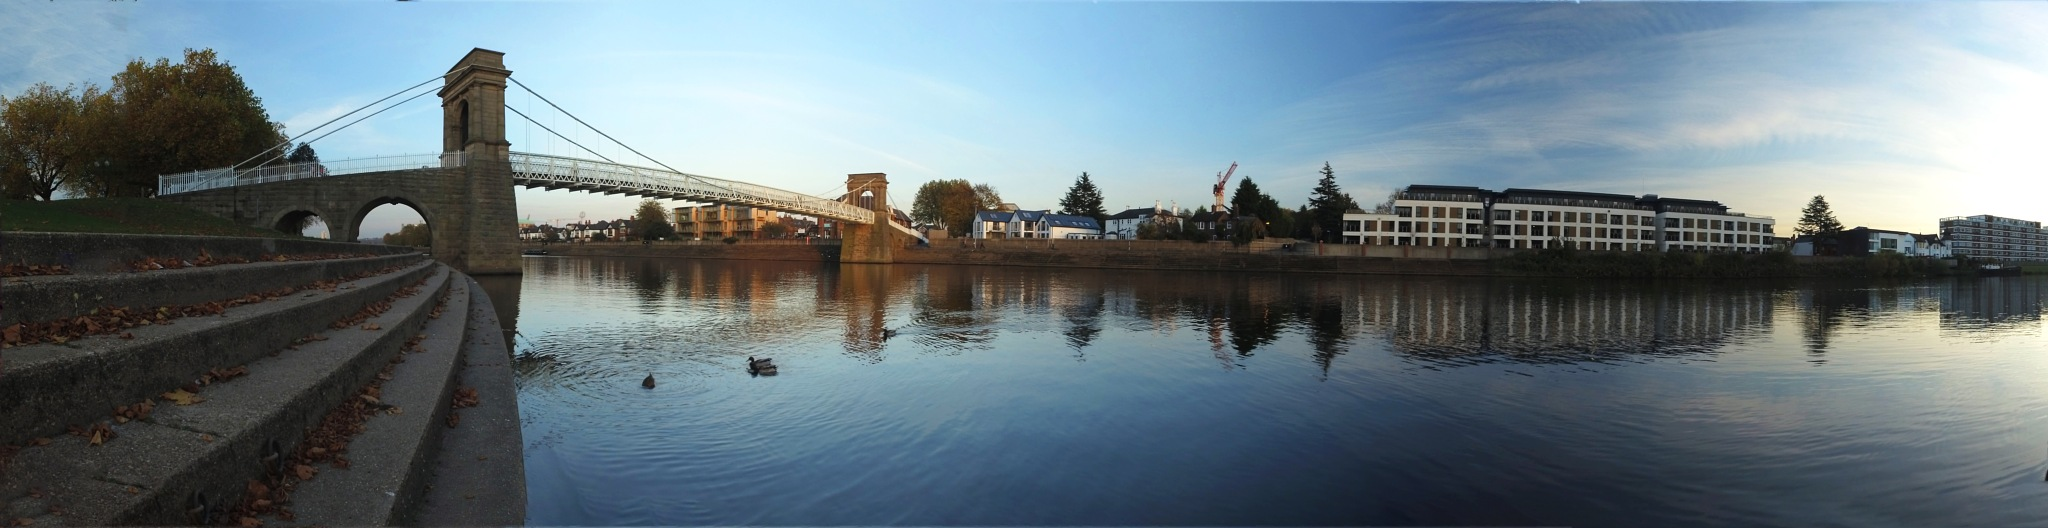 Nottingham Trent Embankment Panorama by Les Kent